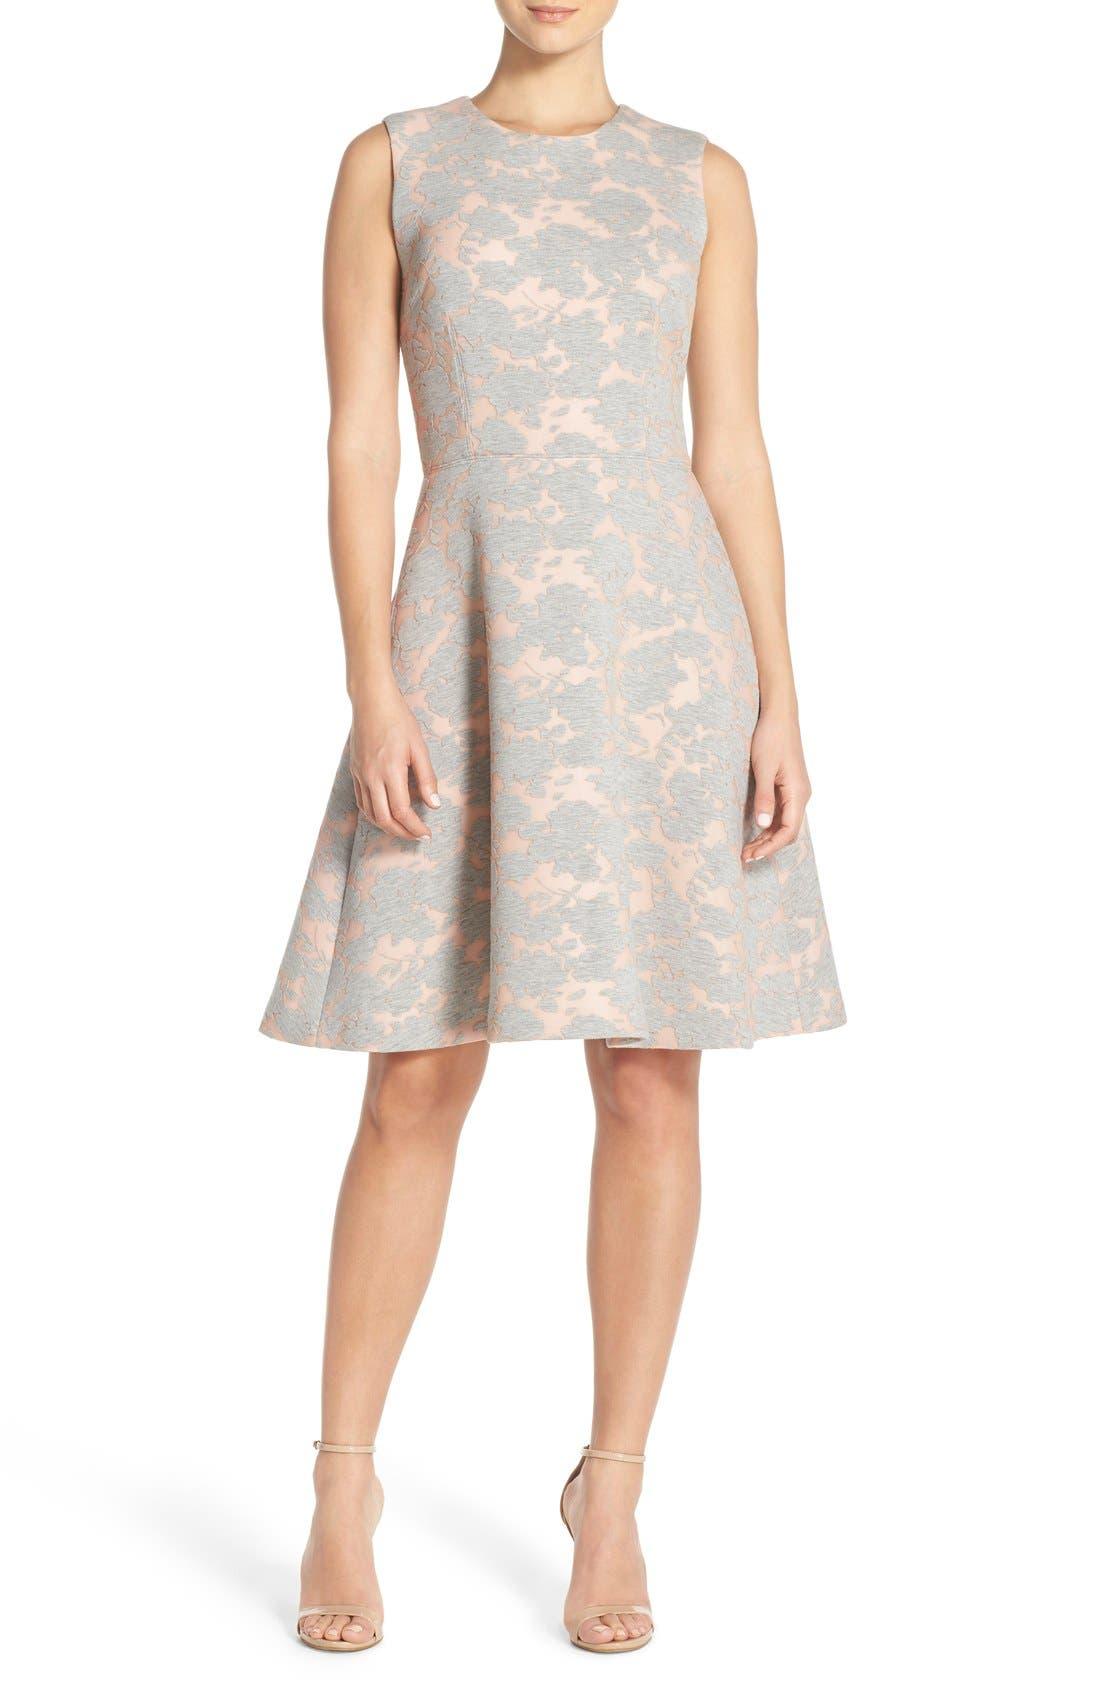 Alternate Image 1 Selected - Maggy London Burnout Jersey Fit & Flare Dress (Regular & Petite)